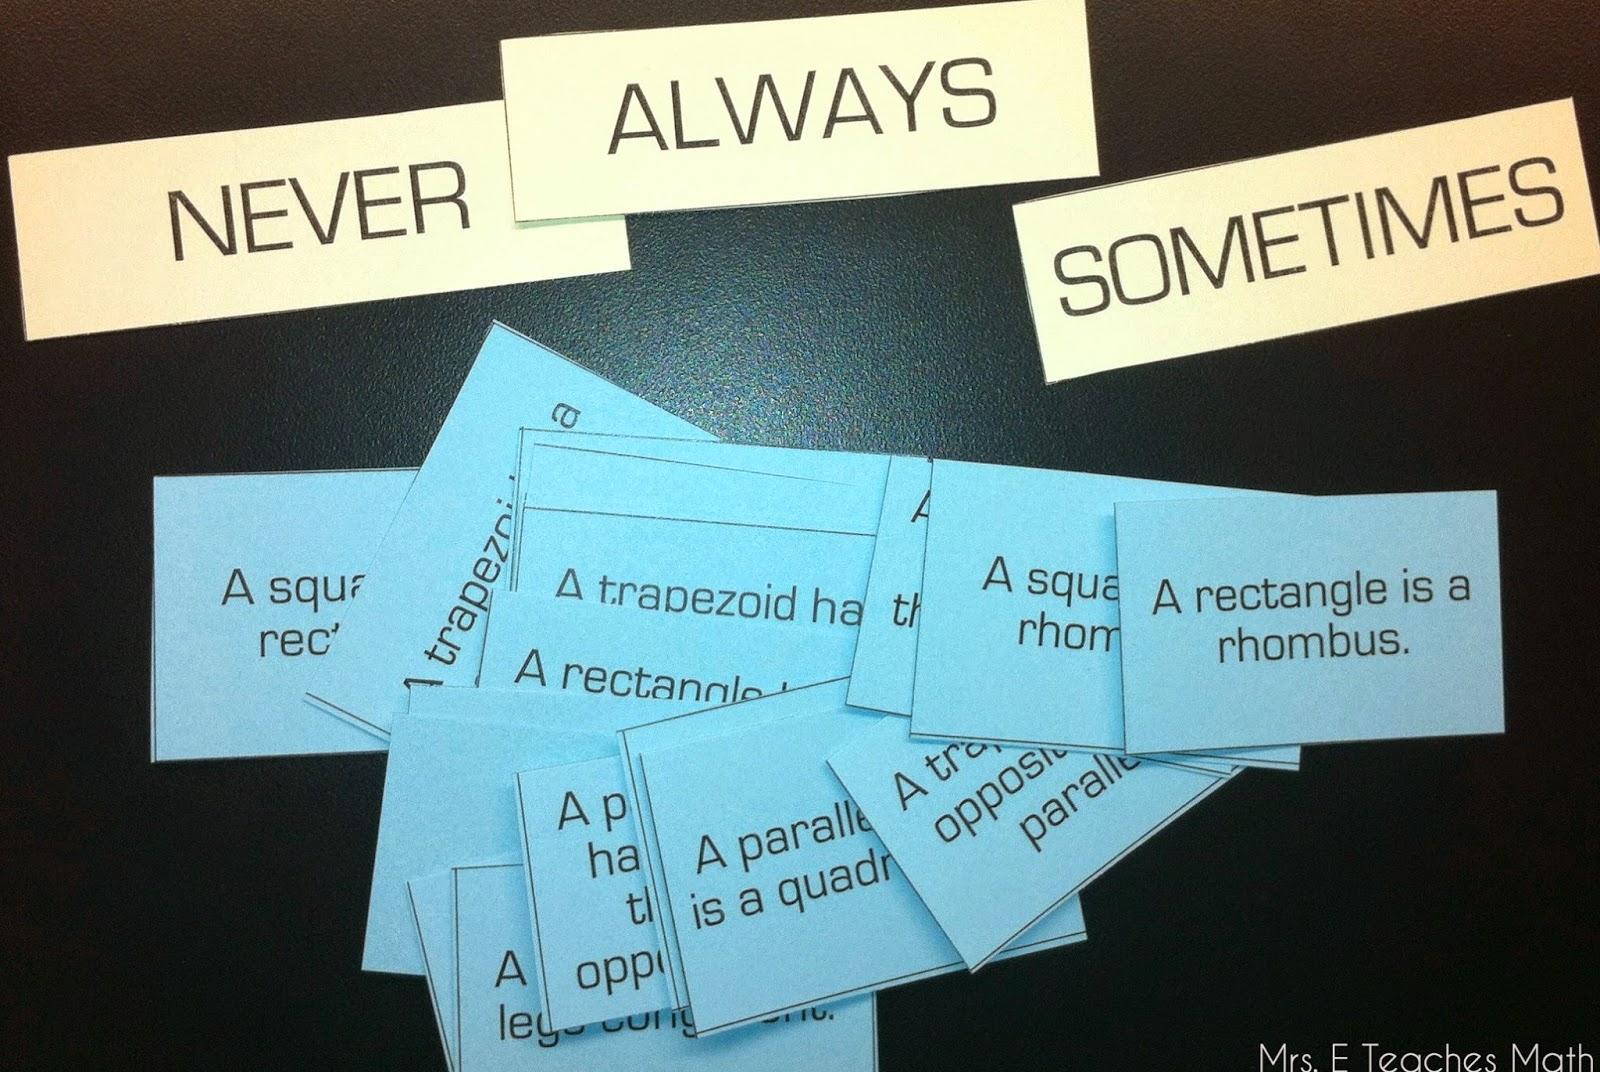 Special Quadrilaterals Always, Sometimes, Never - Using a card sort  |  mrseteachesmath.blogspot.com